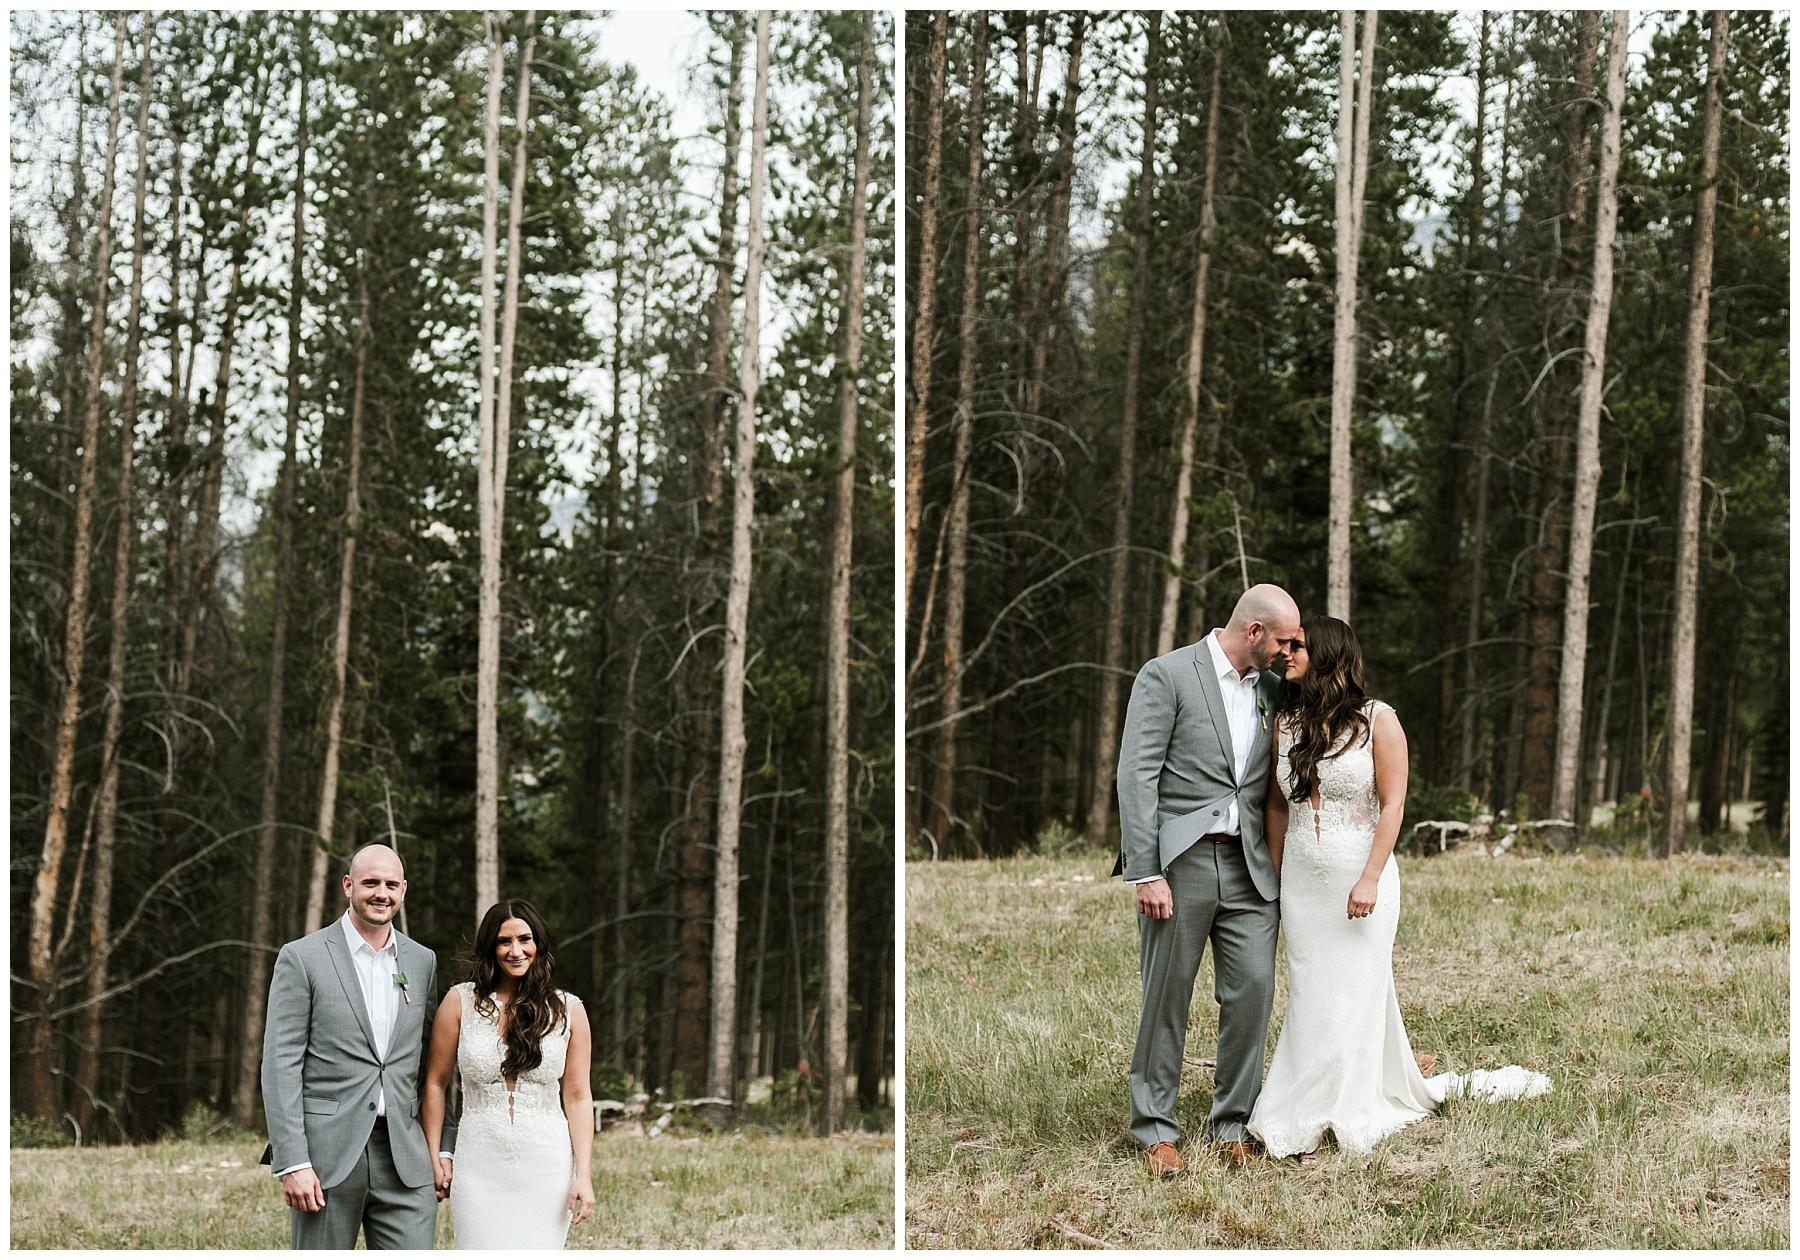 Katesalleyphotography-163_married in Breckenridge.jpg